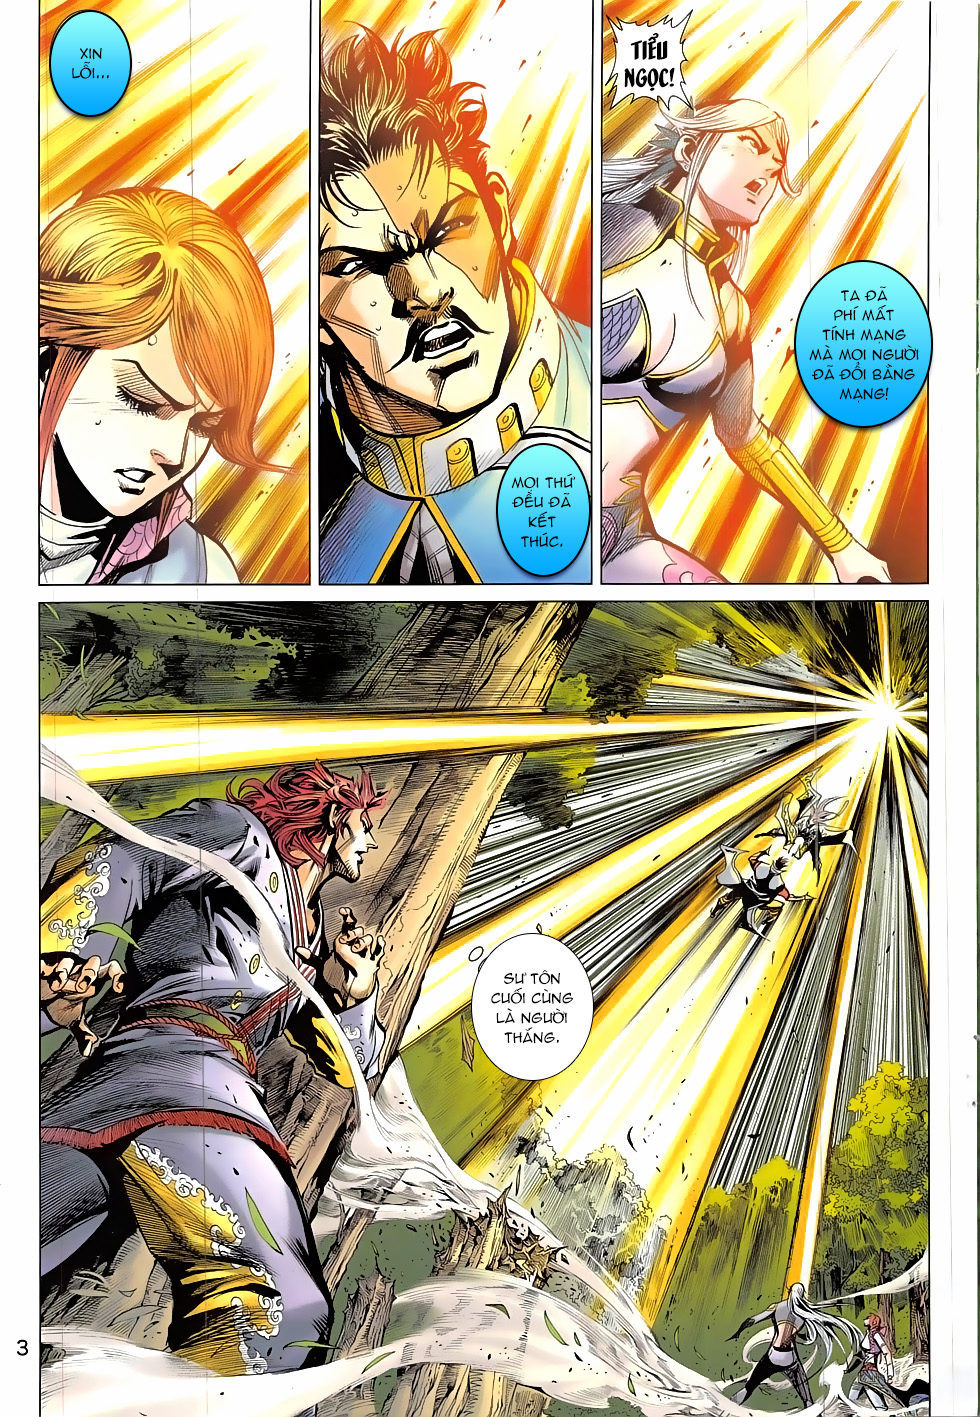 Thần Chưởng chap 24 – End Trang 3 - Mangak.info